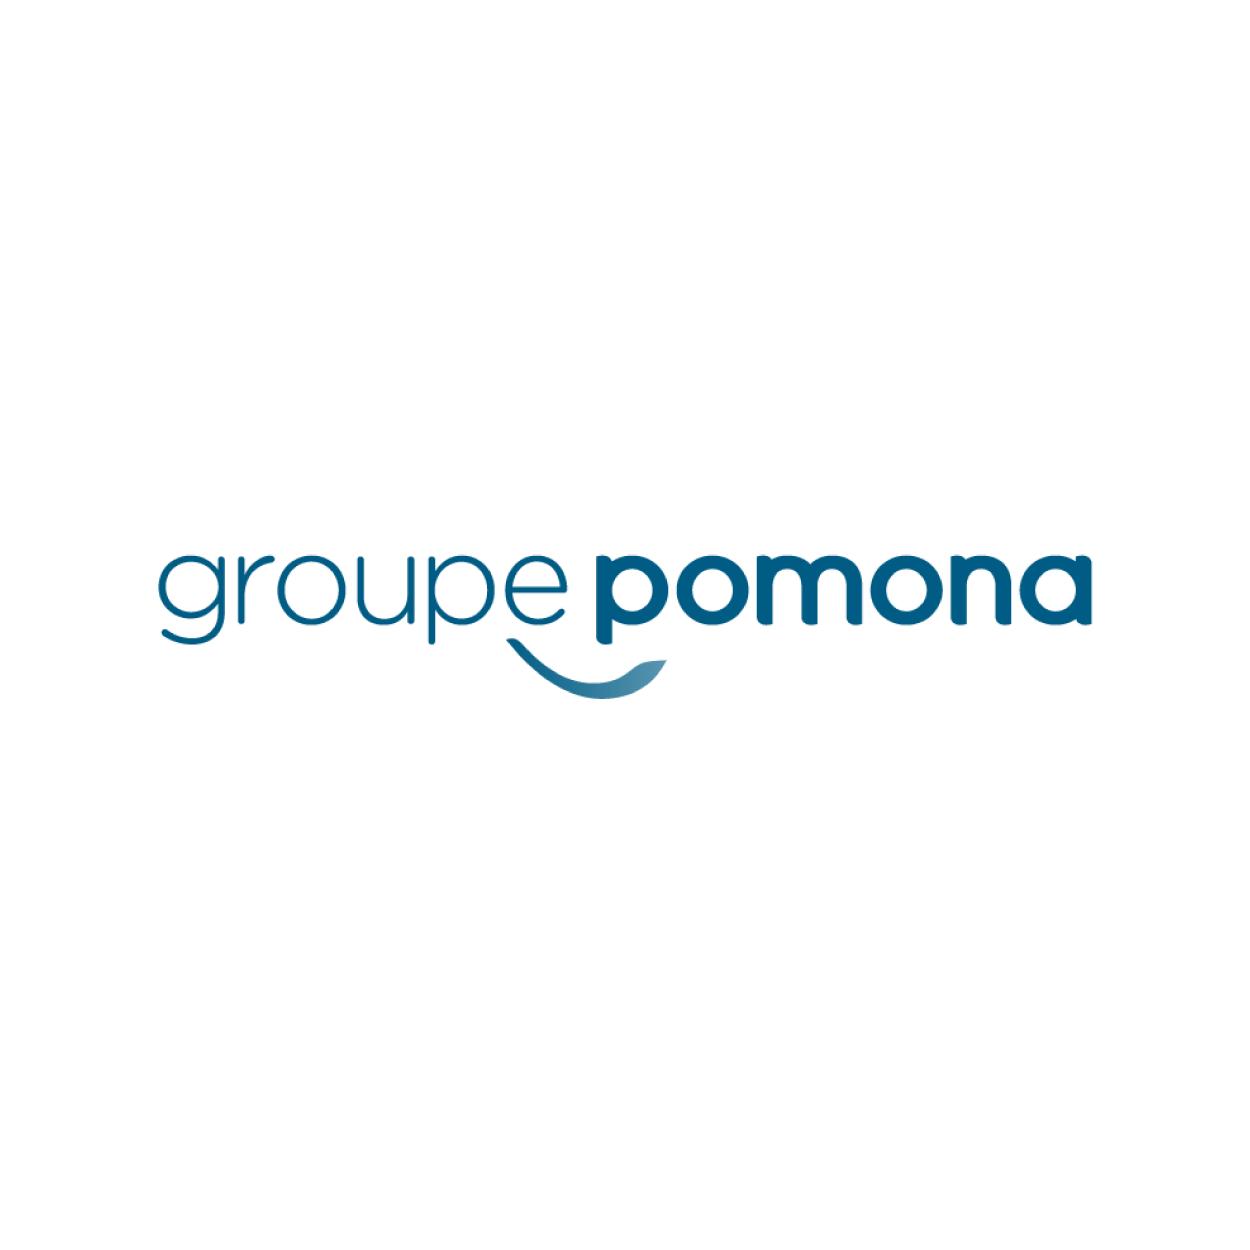 groupepanoma1250x1250